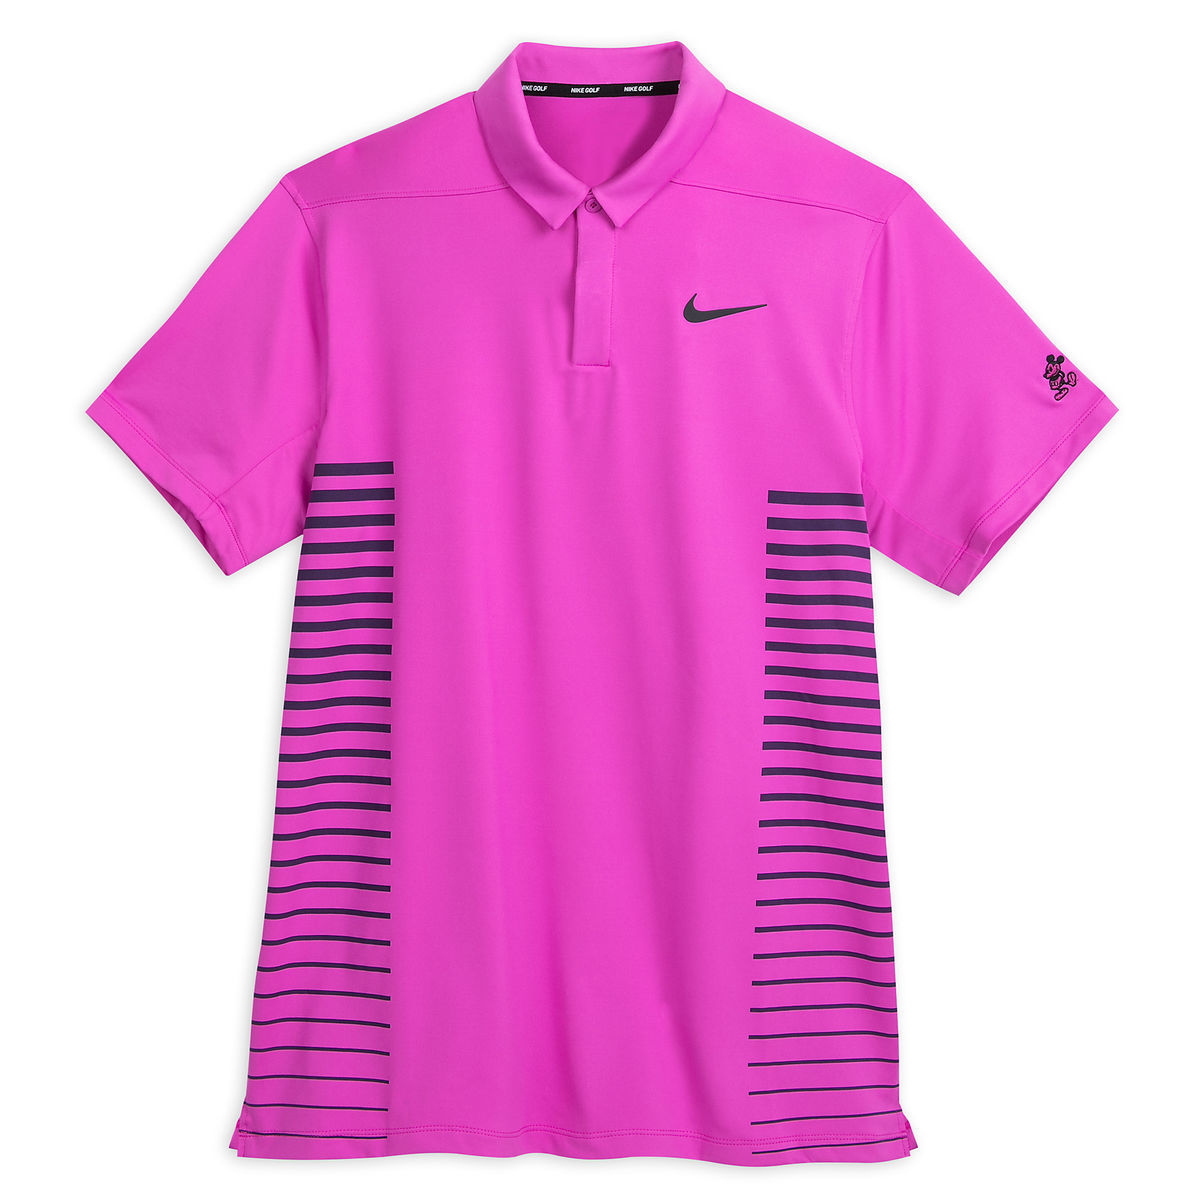 7ad6c9f93fee Disney Men s Shirt - Mickey Performance Nike Golf Polo Shirt - Magenta